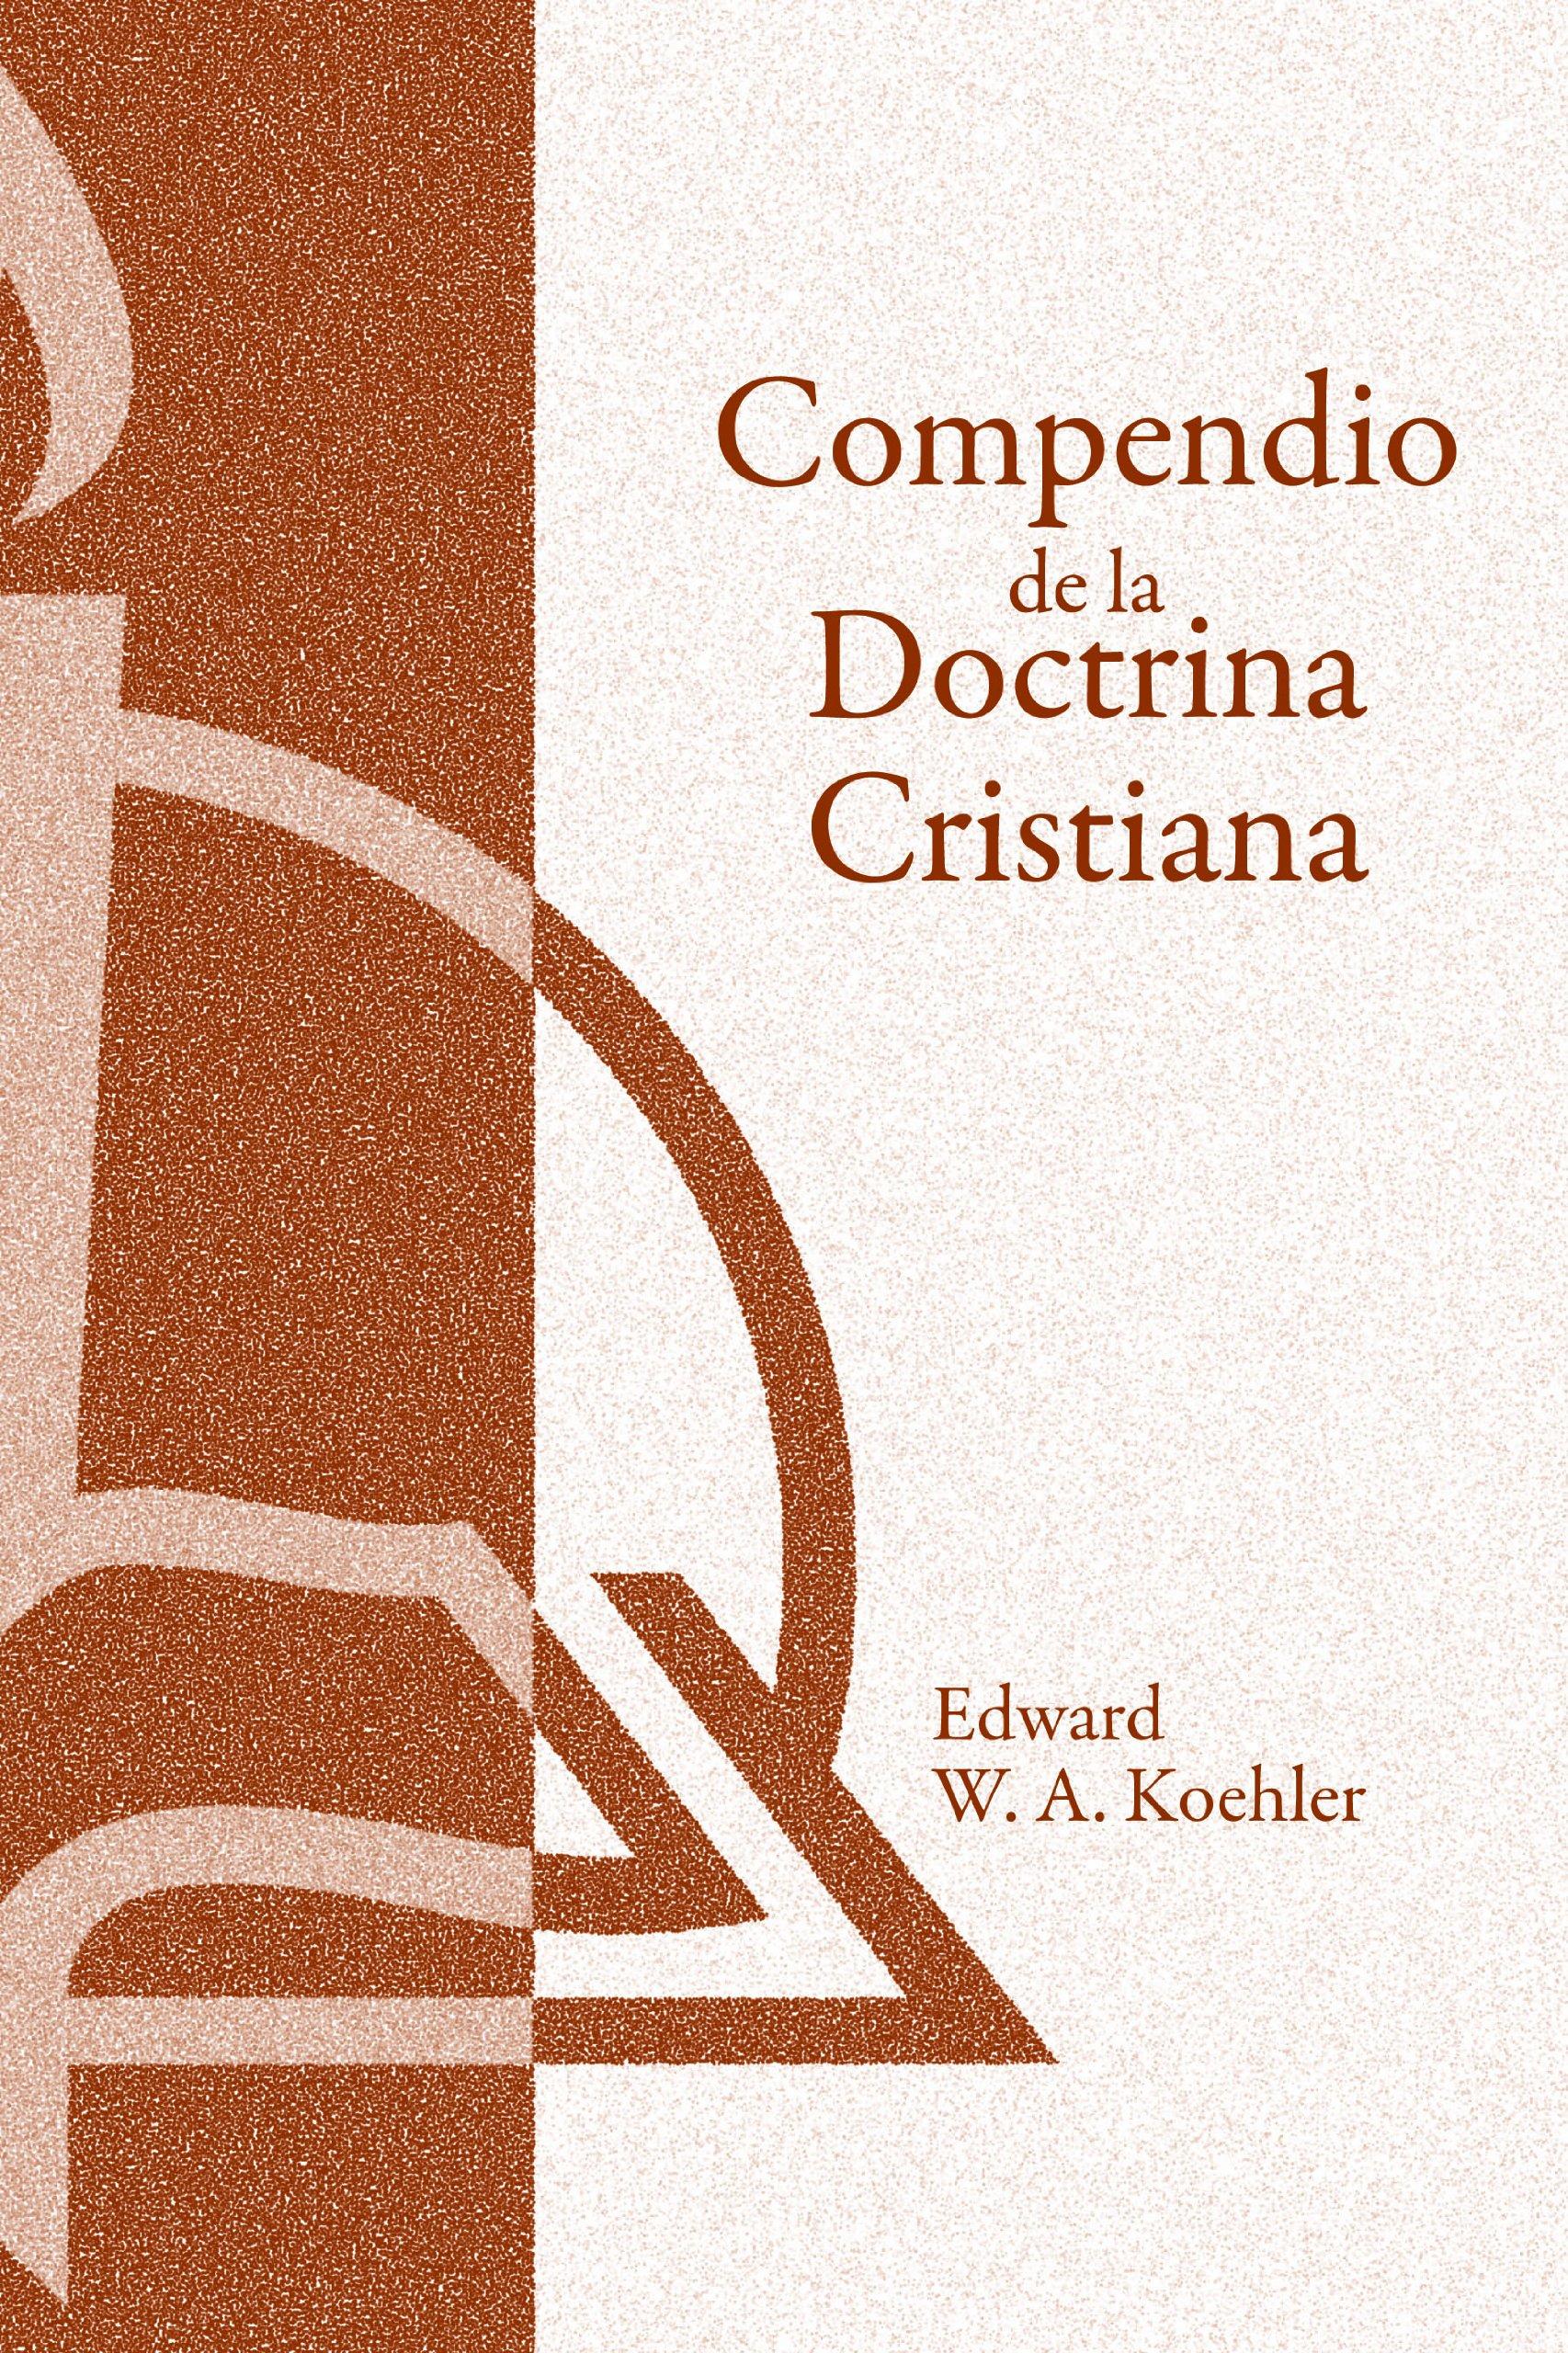 Compendio De La Doctrina Cristiana (Spanish Edition): Edward W. A. Koehler:  9780570051404: Amazon.com: Books